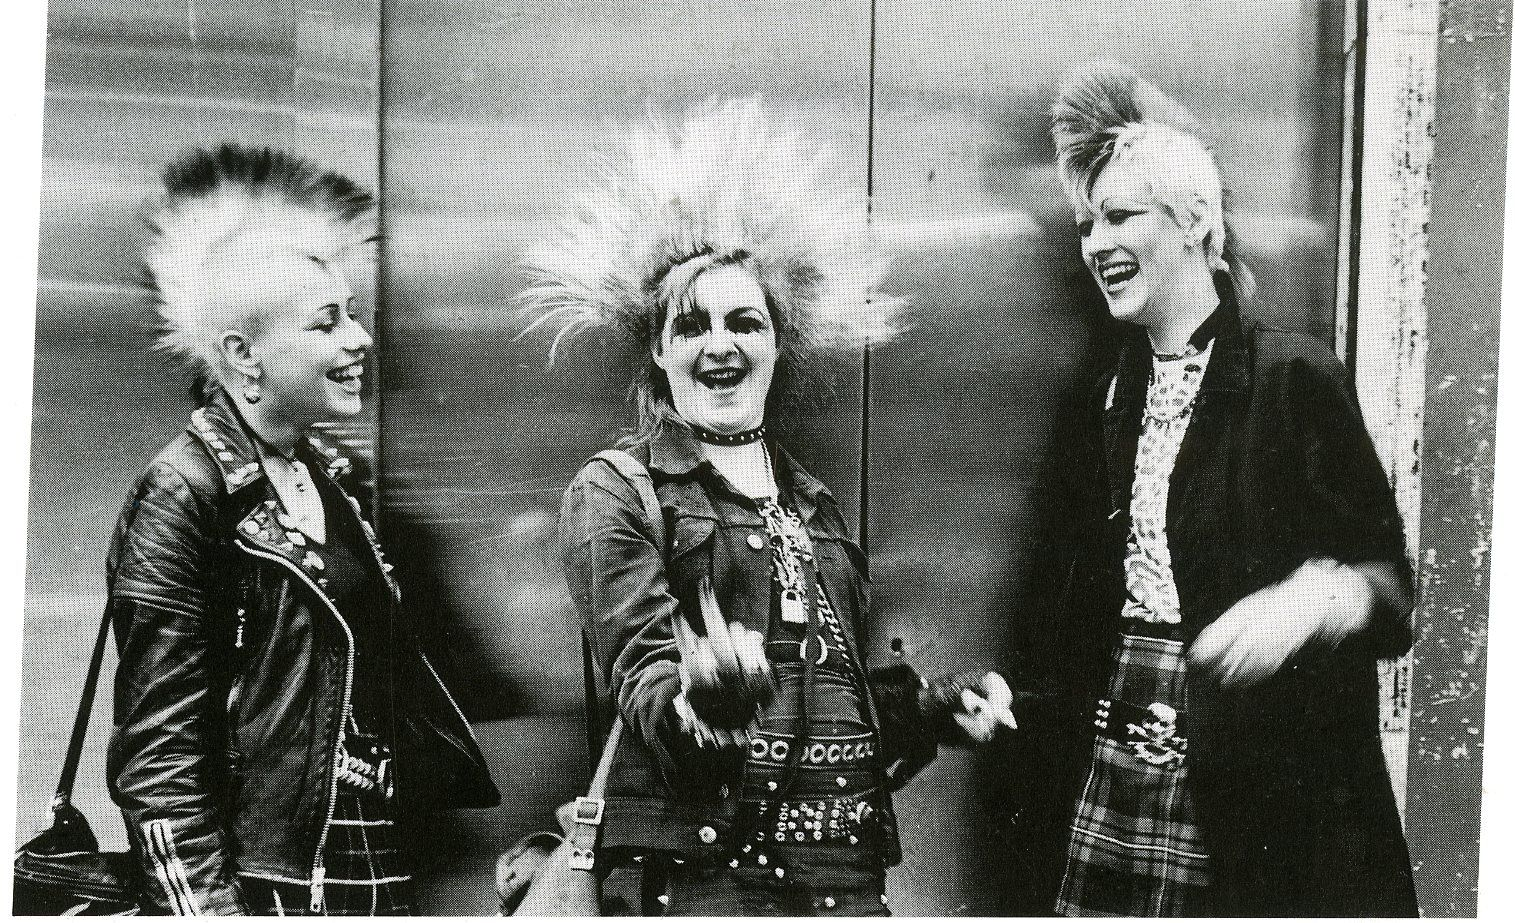 punk rock artists 1970s